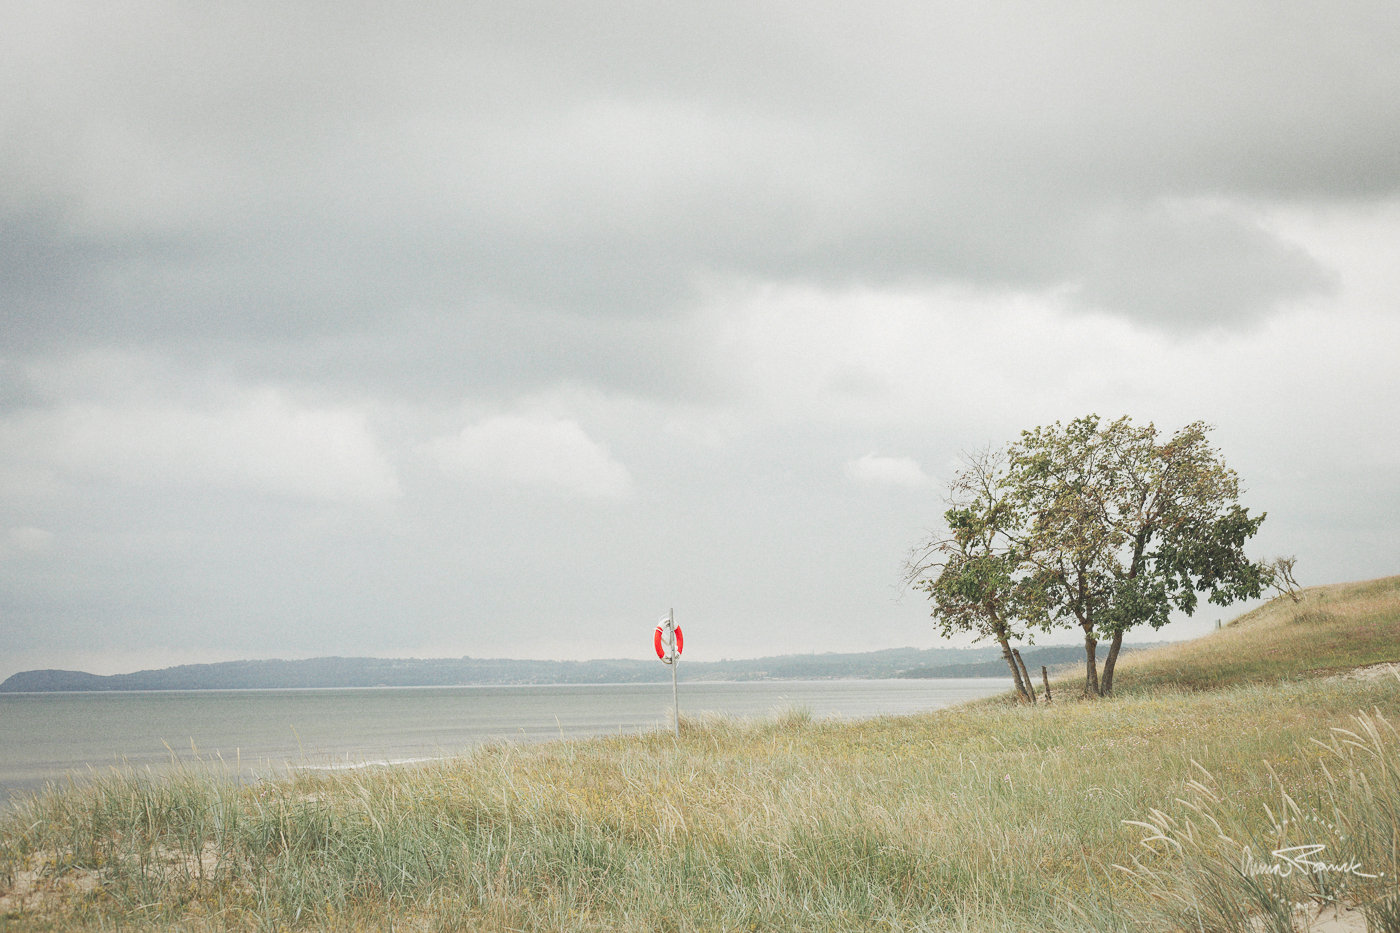 anna, franck, photography, stockholm, photographer, pargas, finland, sweden, portraits, skåne, österlen, baskemölla, natural, green, summer, countrylife, coast, beach, architecture, lifestyle, organic living, baltic, beach